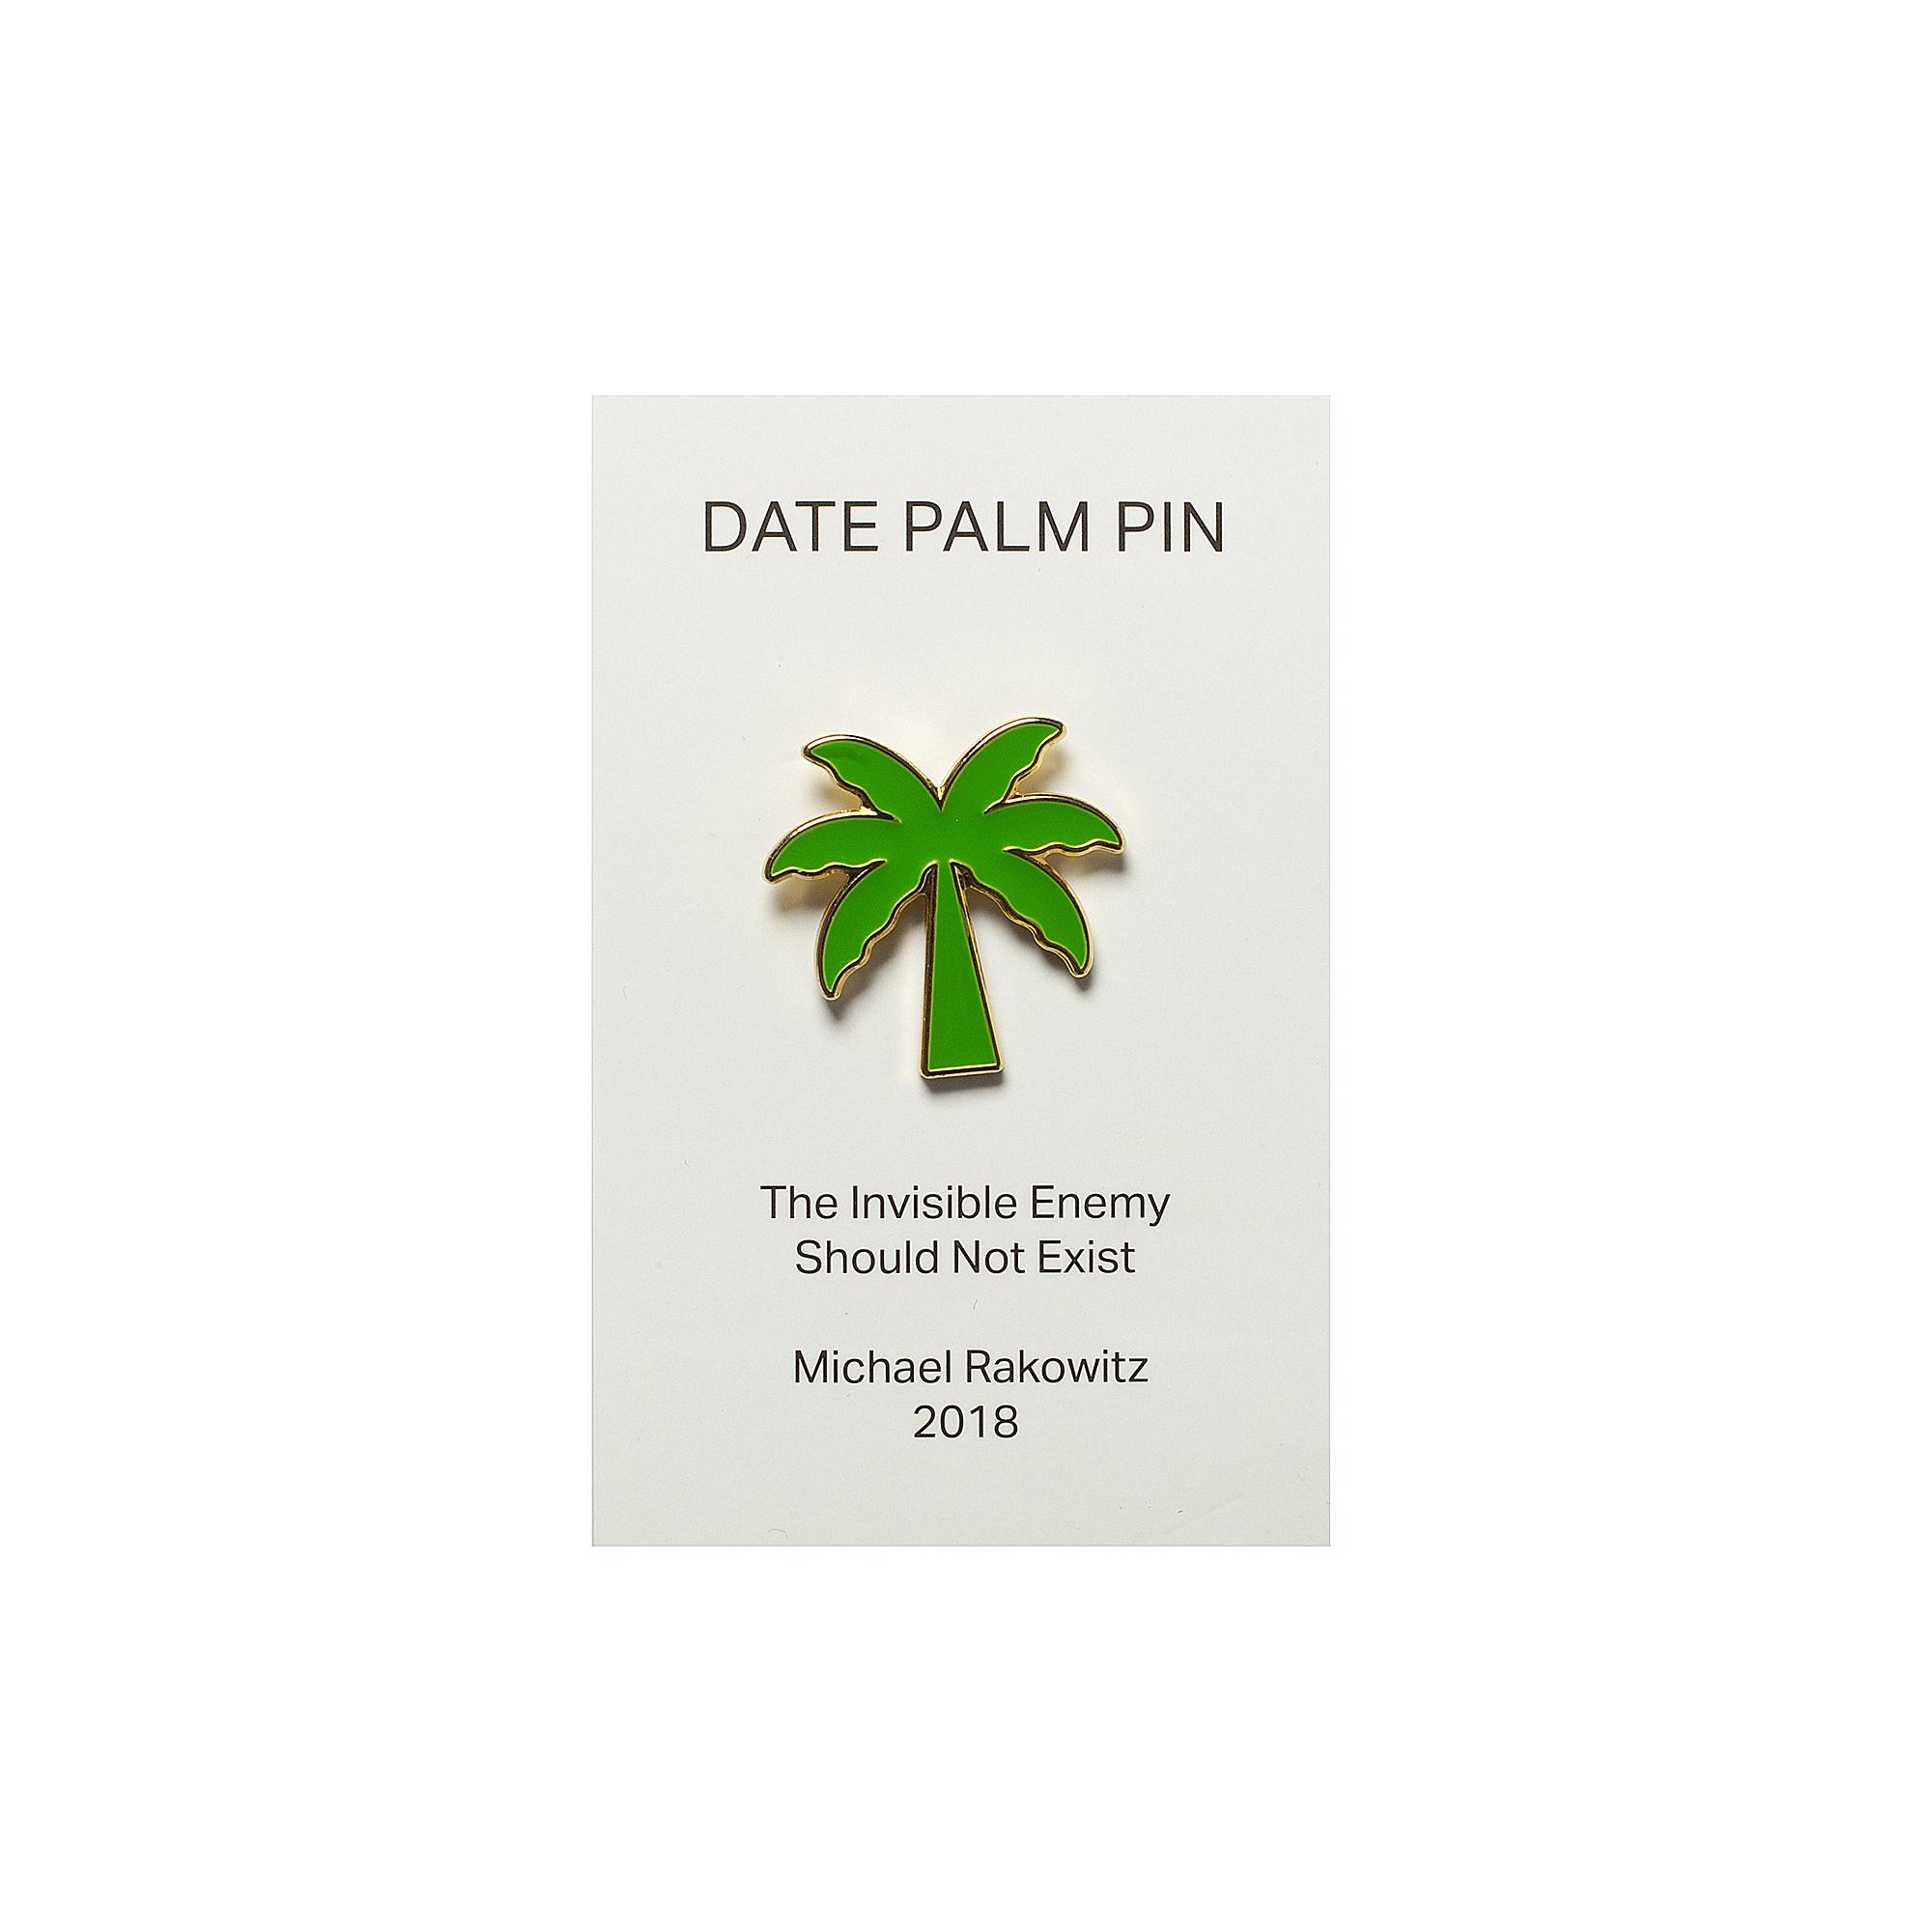 Michael Rakowitz pin badge